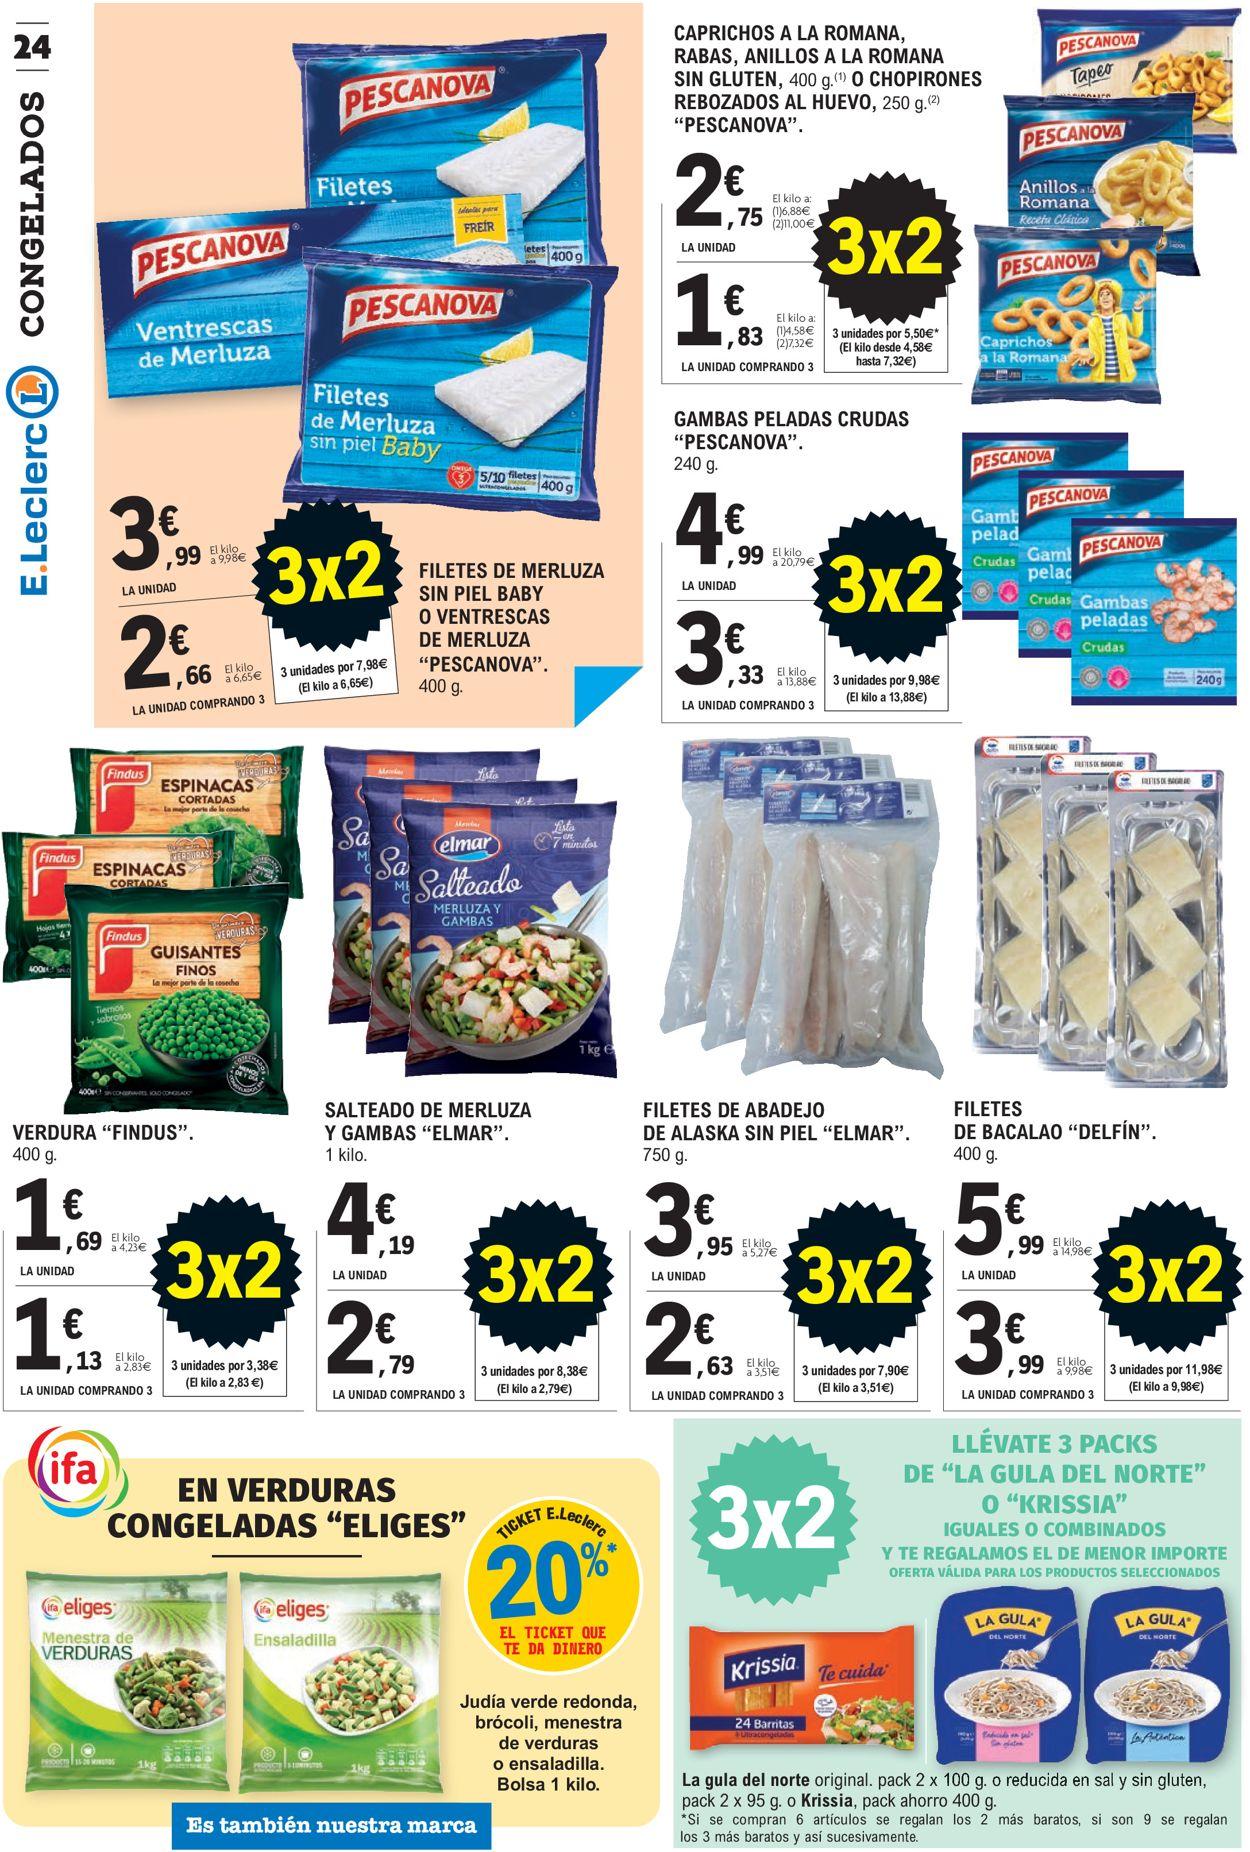 E.leclerc Folleto - 03.02-14.02.2021 (Página 24)